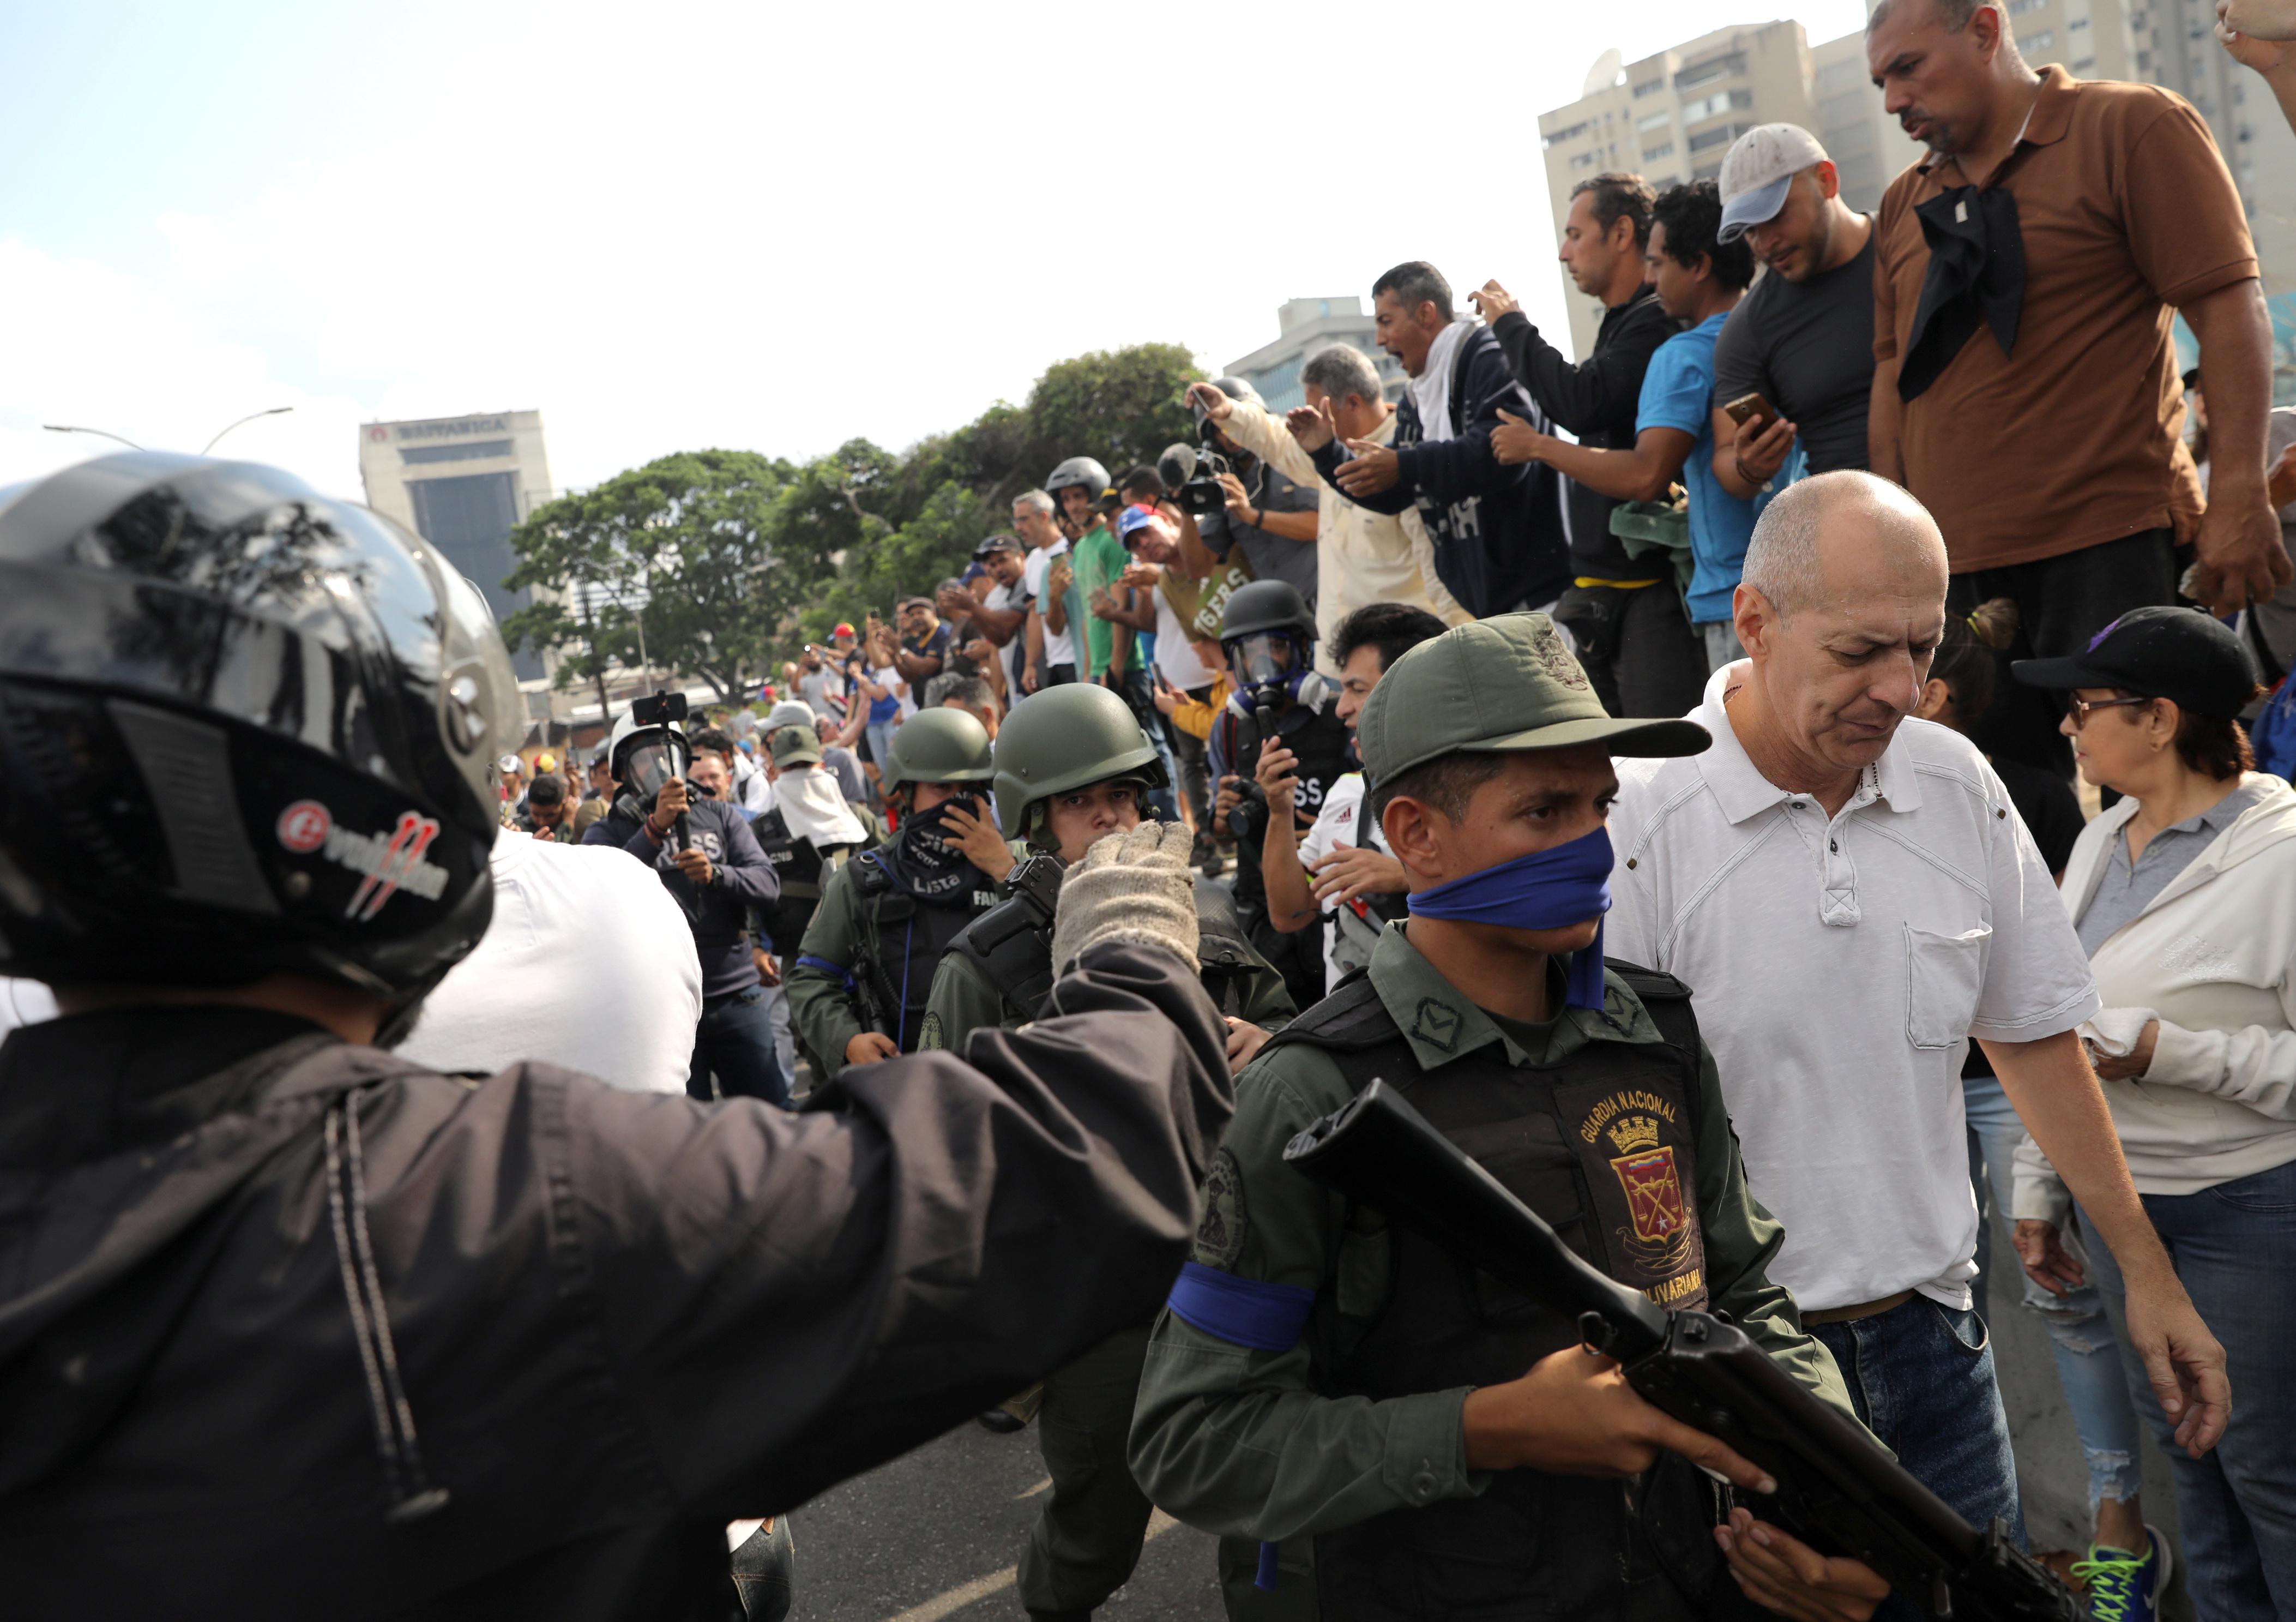 2019-04-30T133100Z_145415216_RC19C04088C0_RTRMADP_3_VENEZUELA-POLITICS